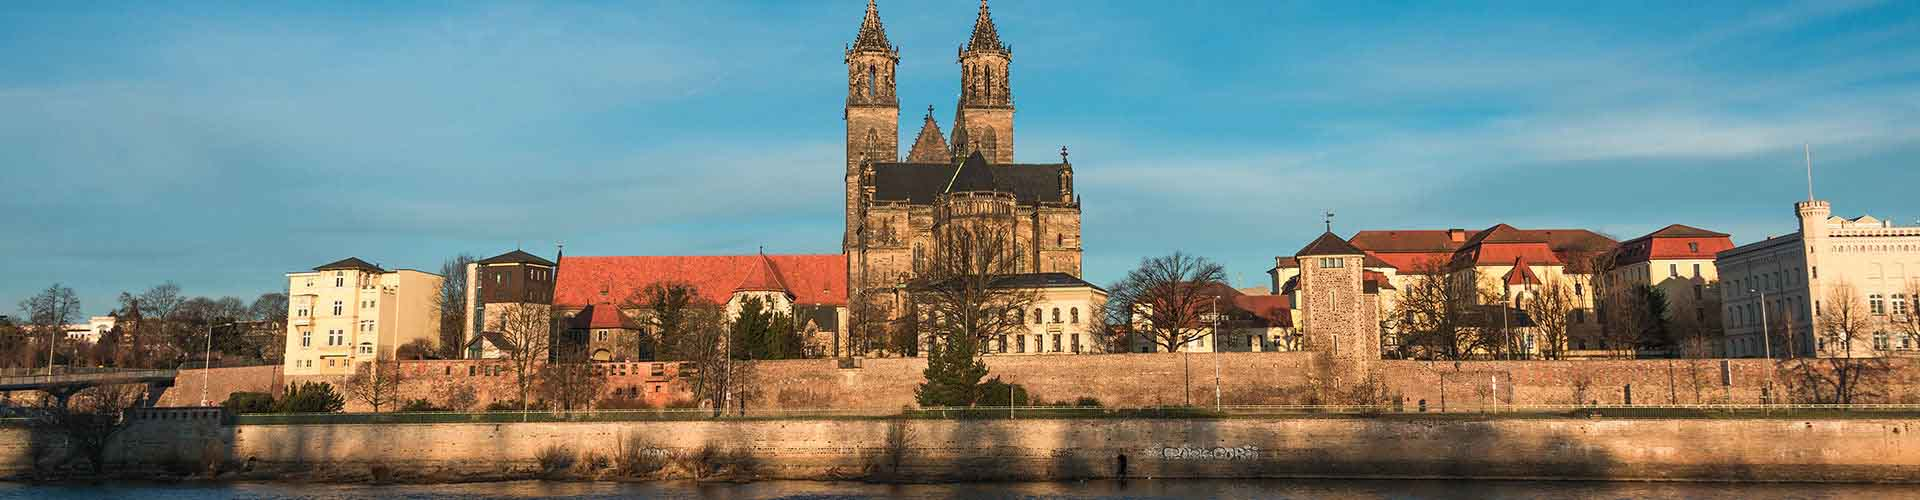 Magdeburgo - Apartamentos en Magdeburgo. Mapas de Magdeburgo, Fotos y comentarios para cada Apartamento en Magdeburgo.